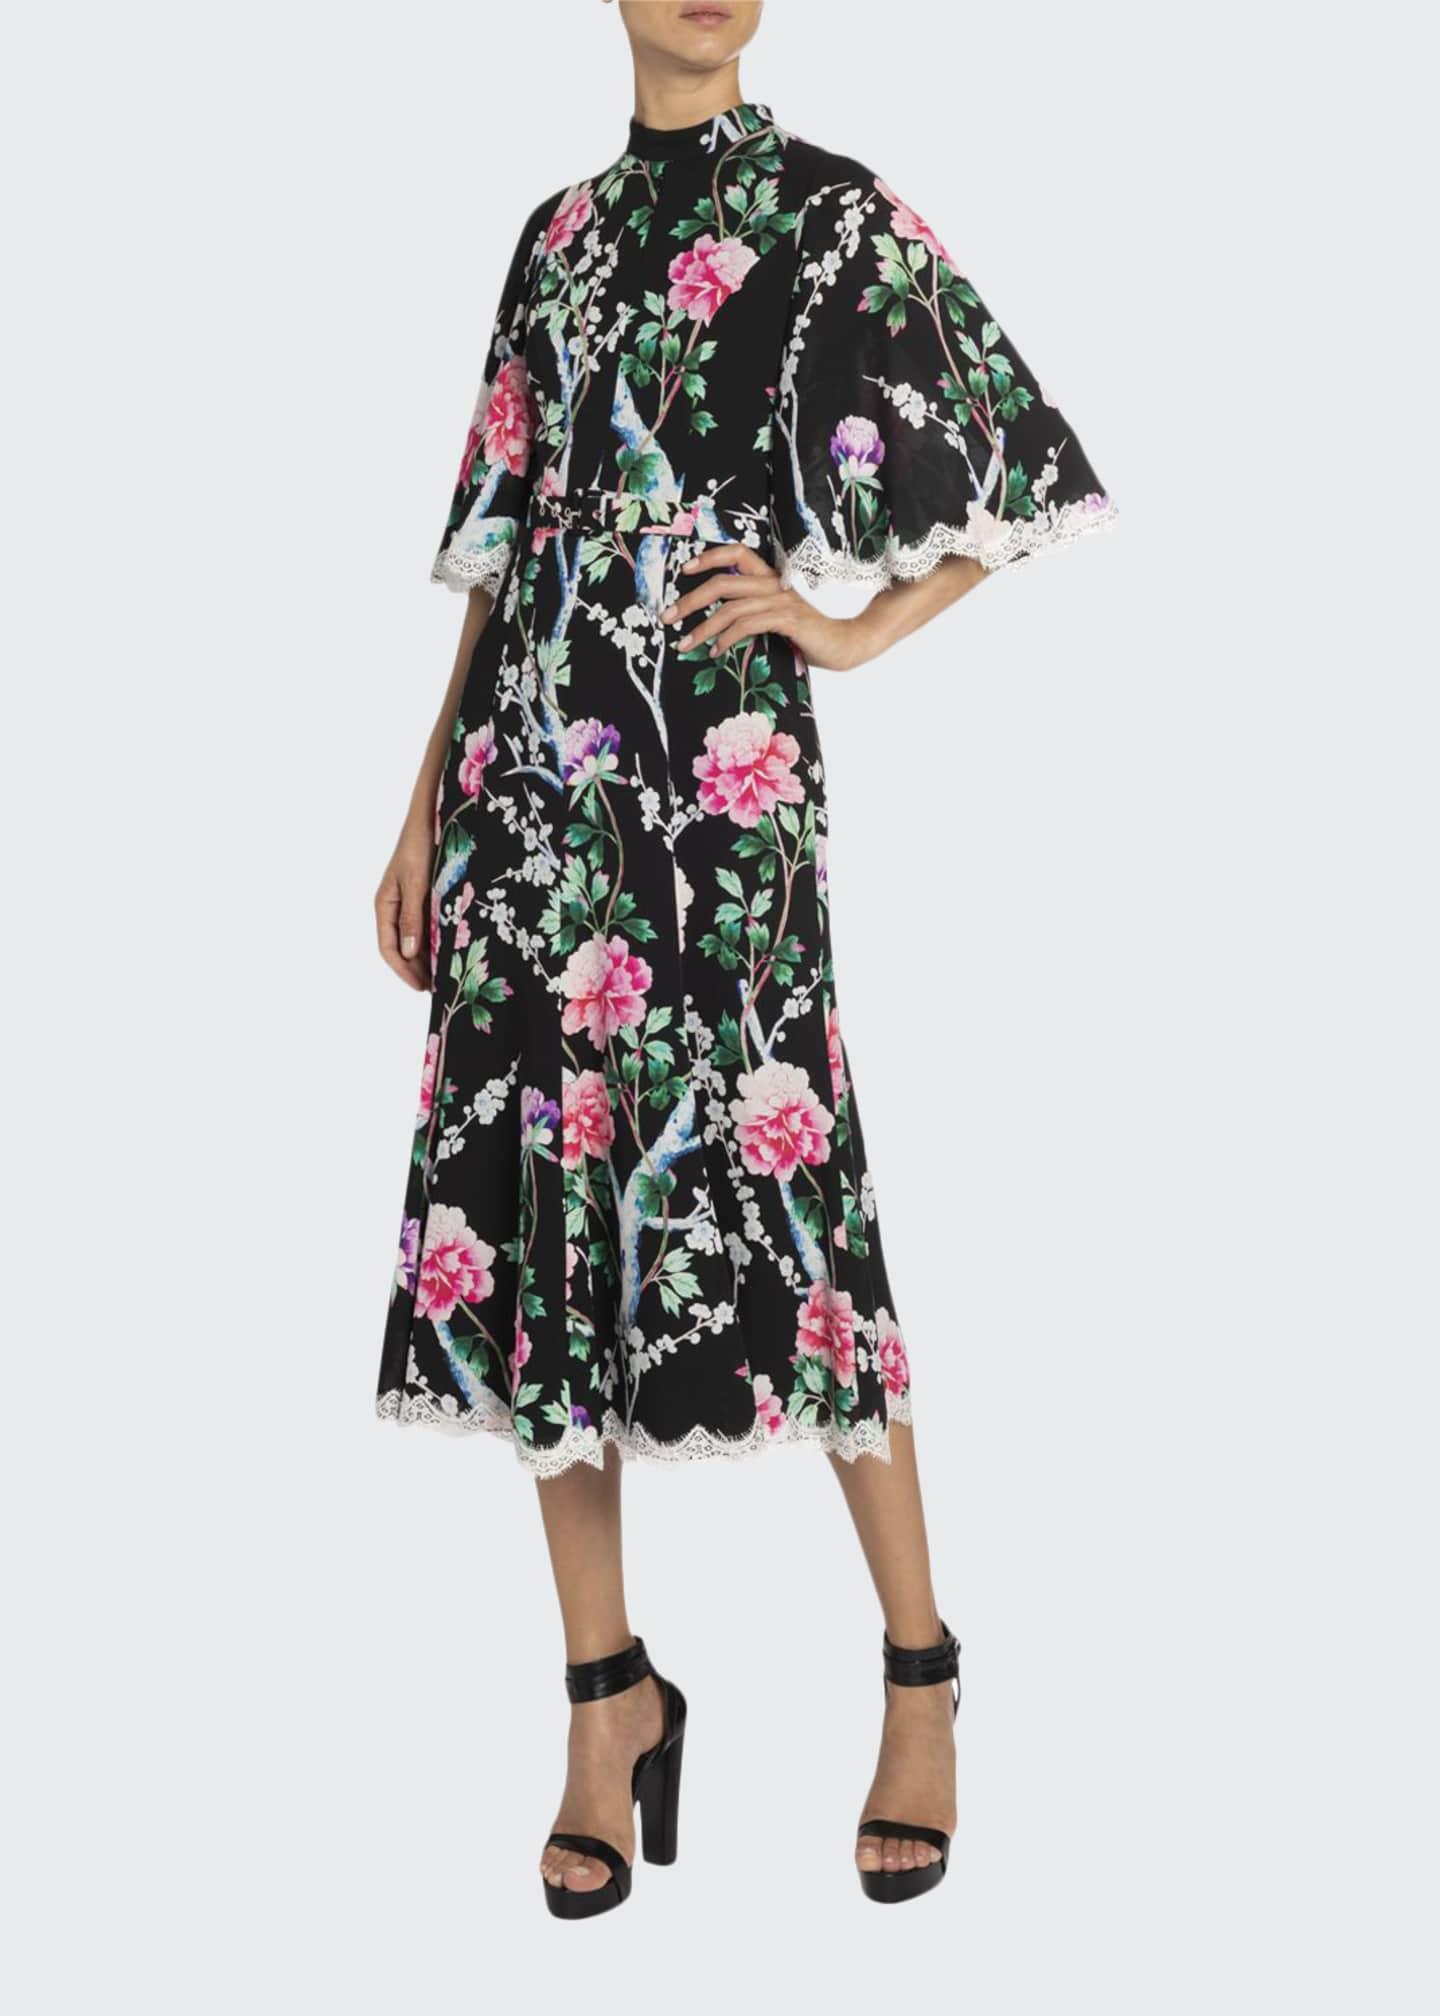 Andrew Gn Lace-Trim Floral Midi Dress